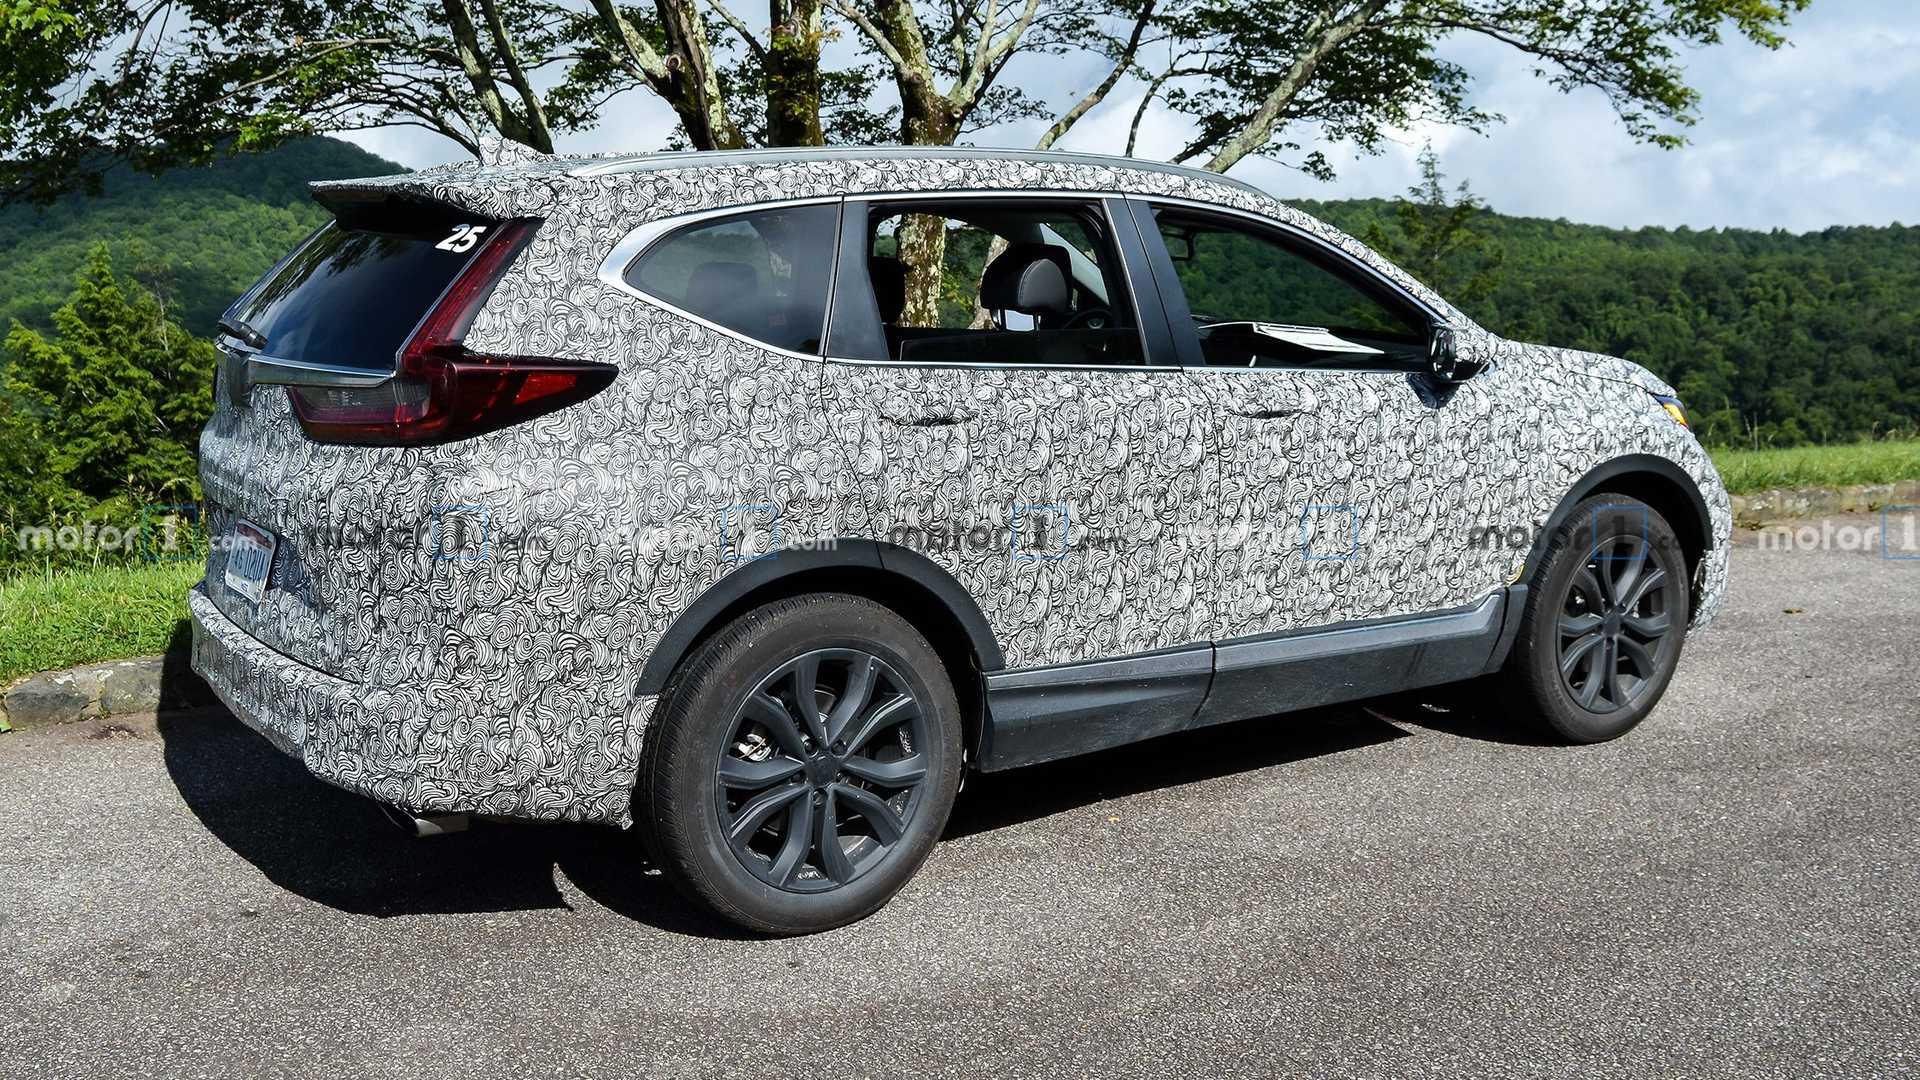 46 Concept of Honda Crv 2020 Model Specs for Honda Crv 2020 Model